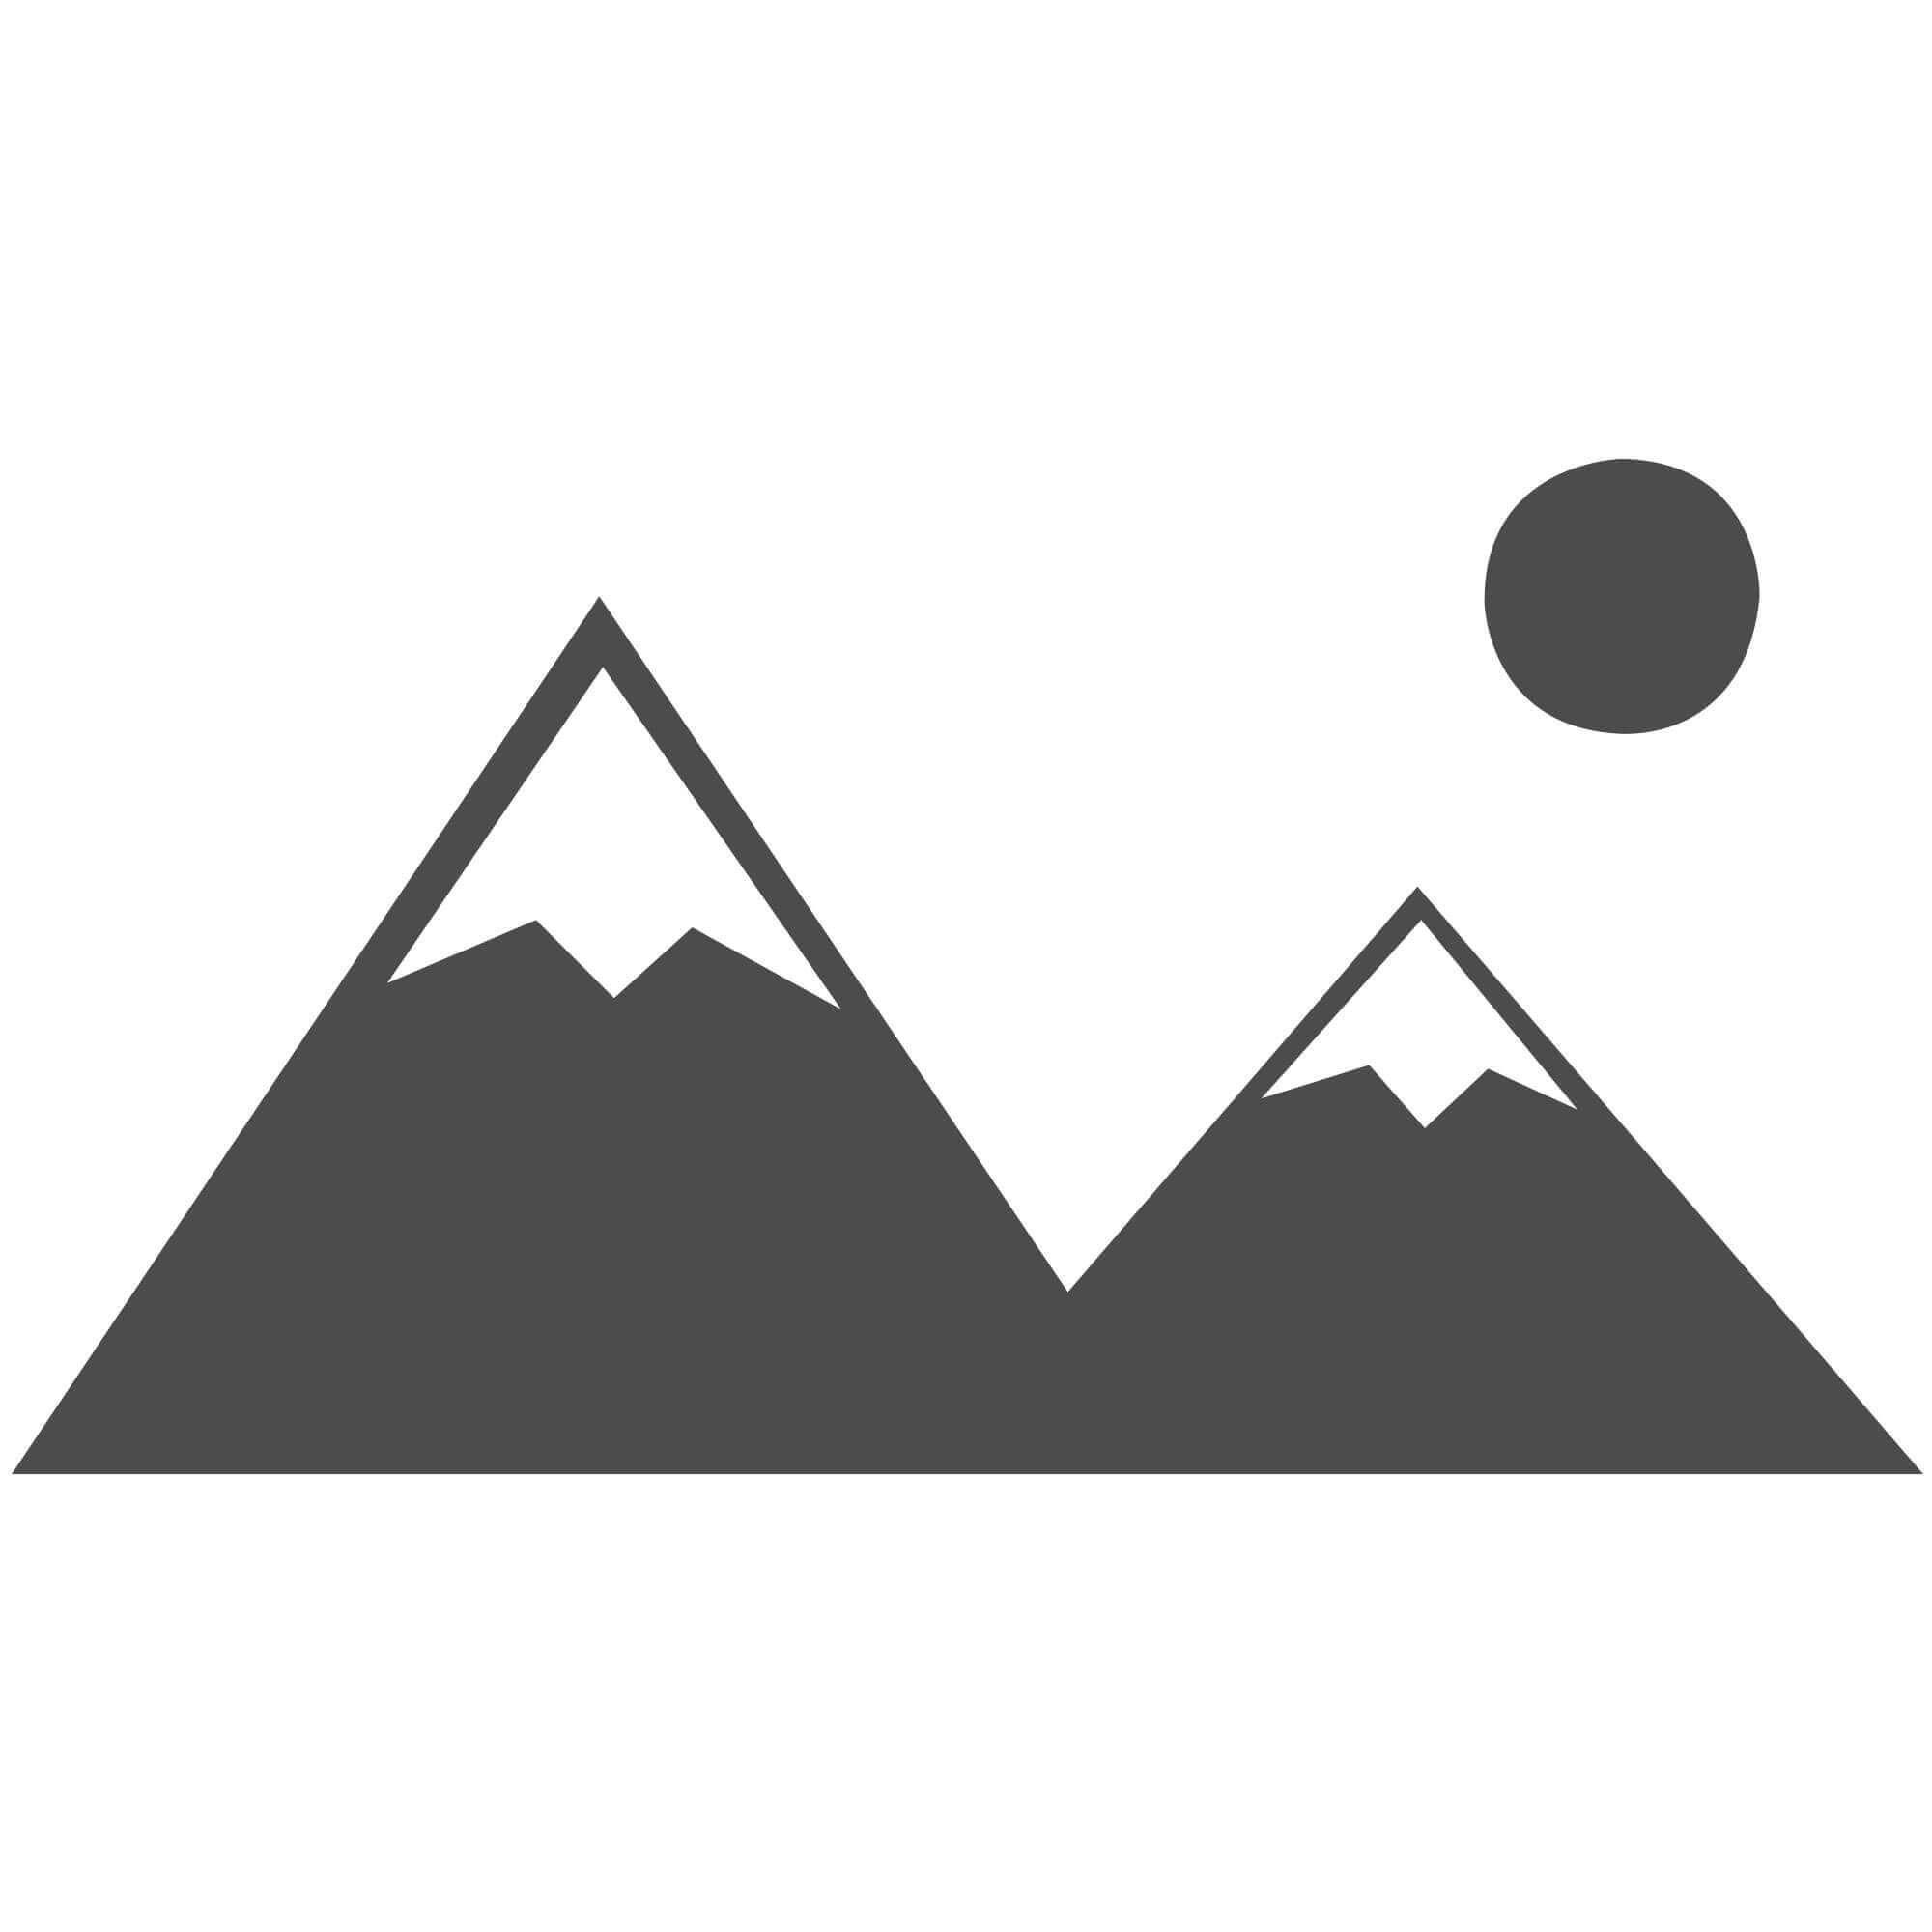 "Griot Stripe Rug - Akadinda - KI802 Saffron-76 x 122 cm (2'6"" x 4')"